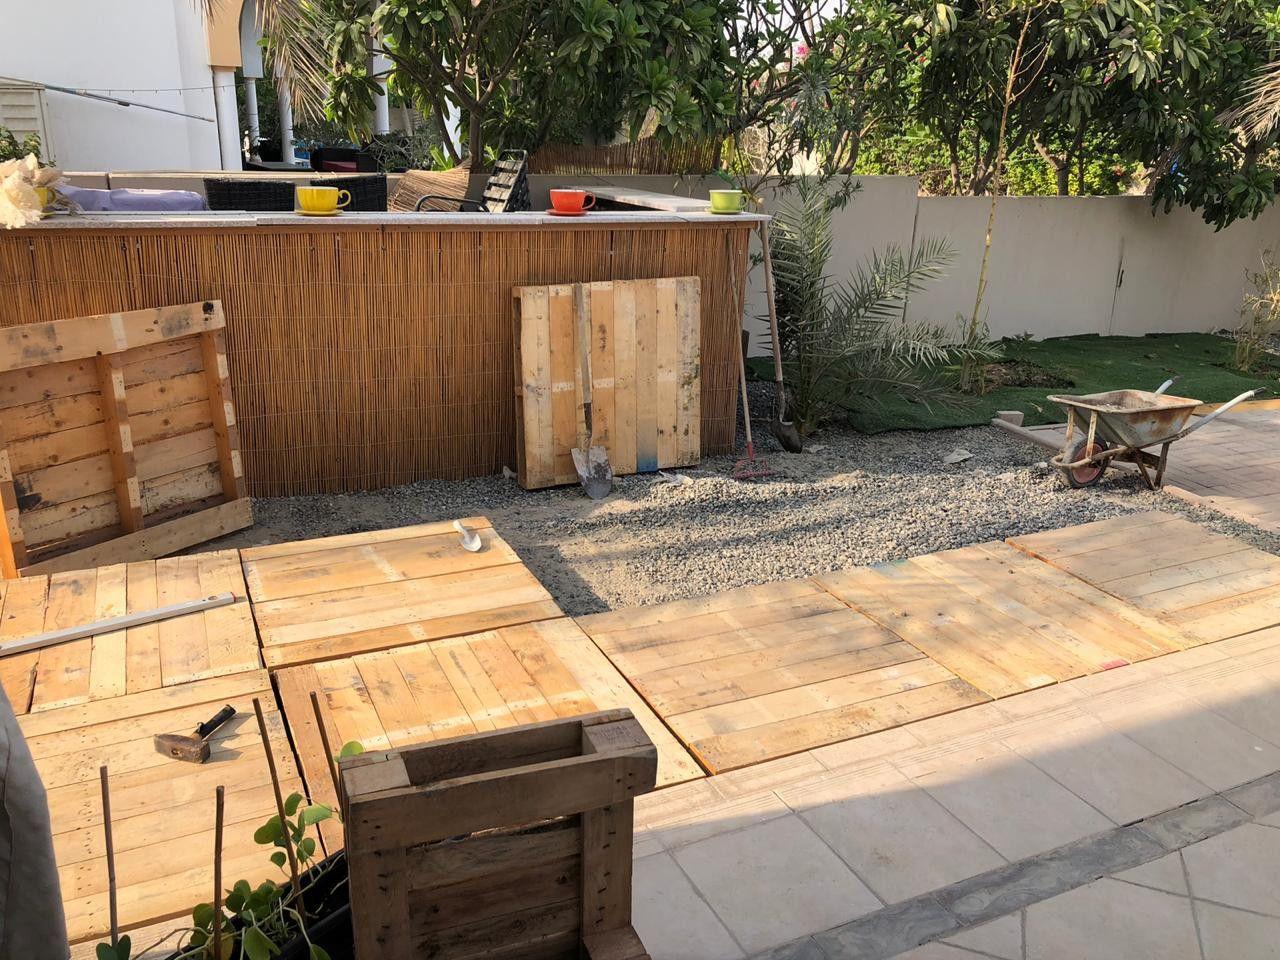 Wooden Pallets 0555450341 28